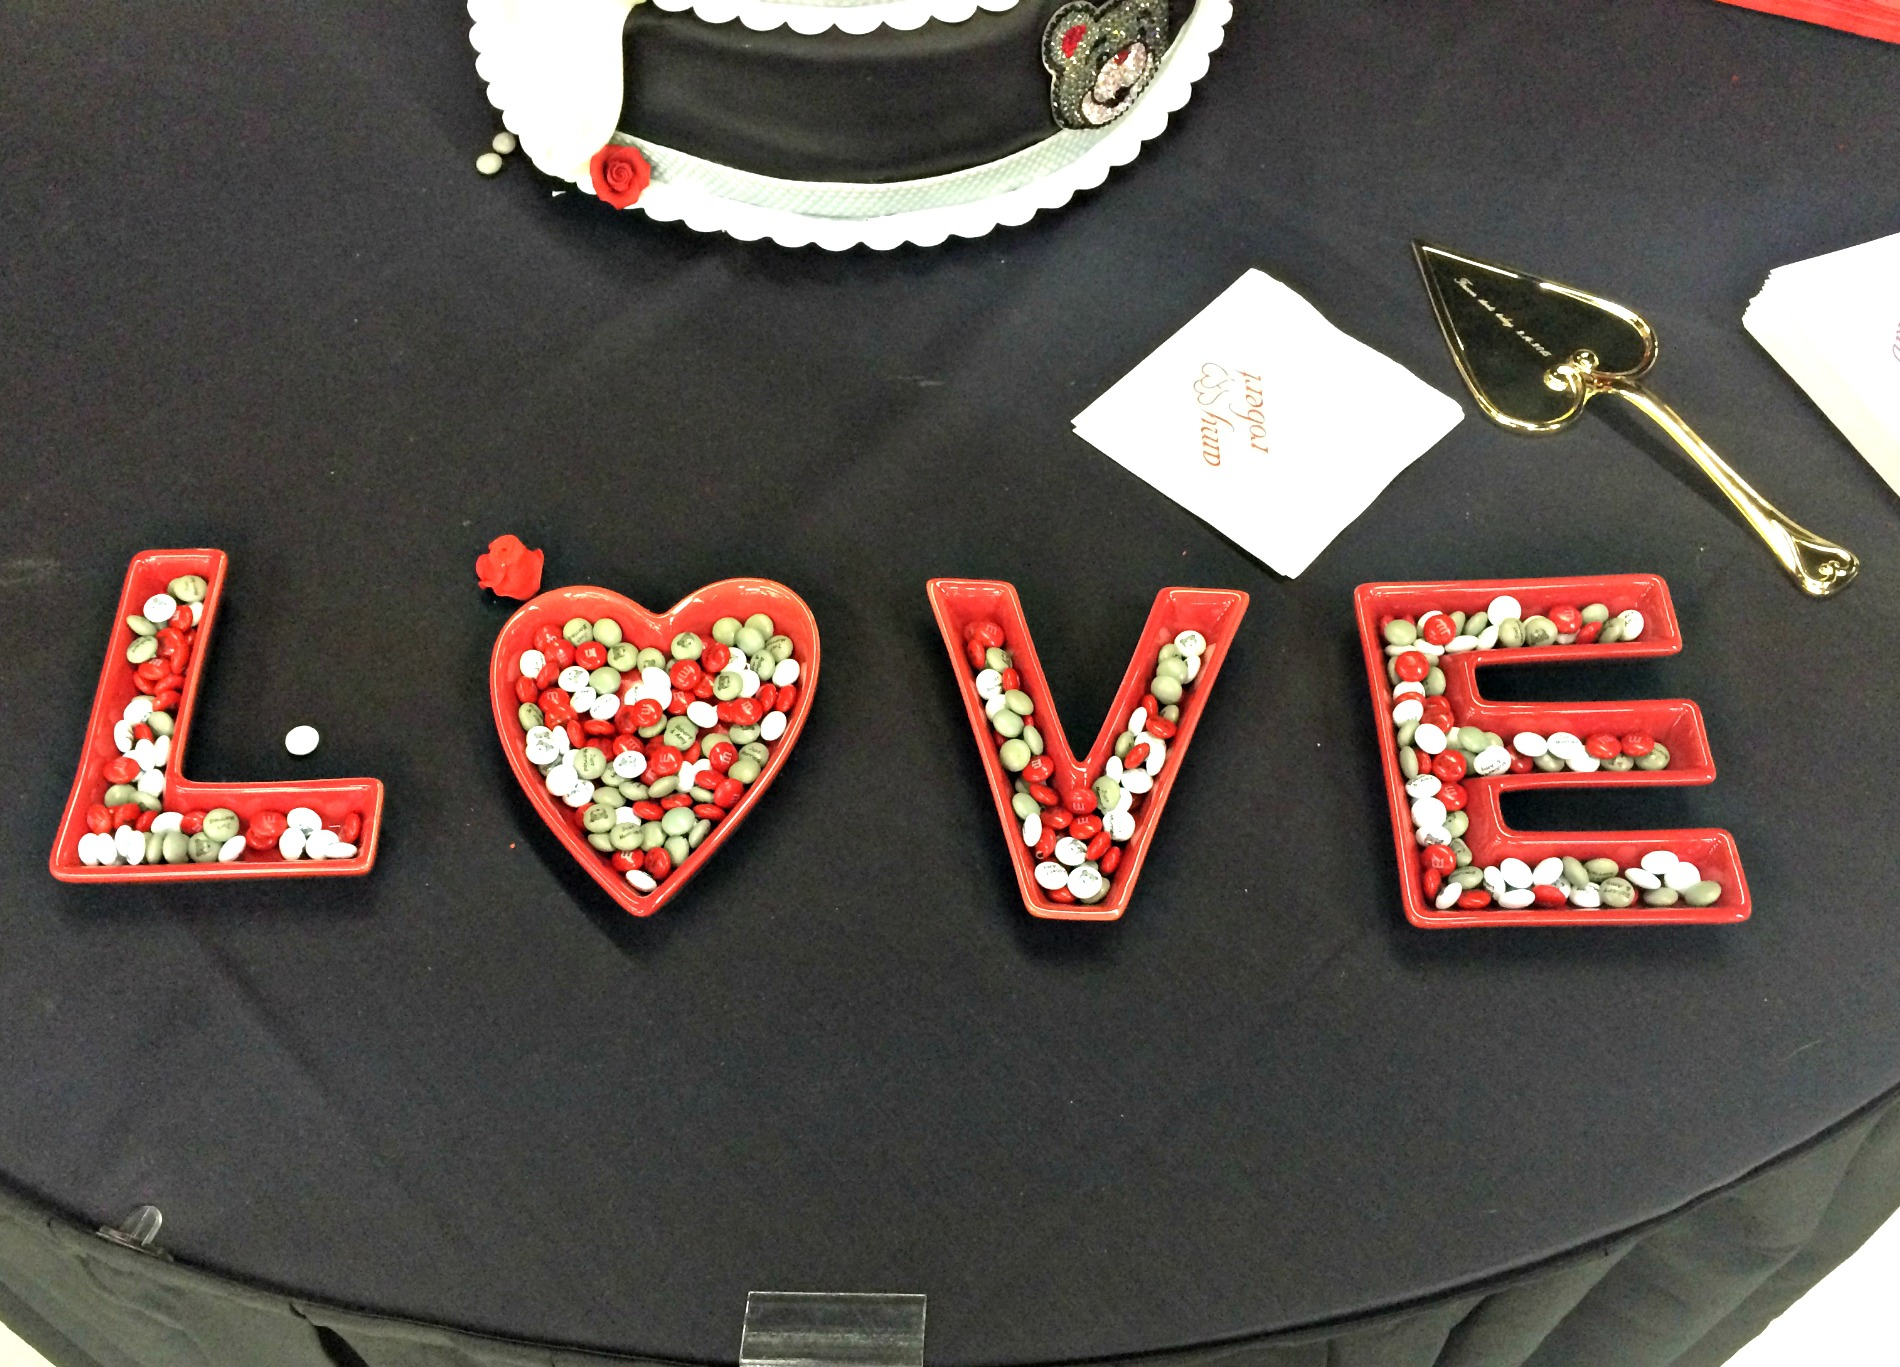 LOVE m&ms display